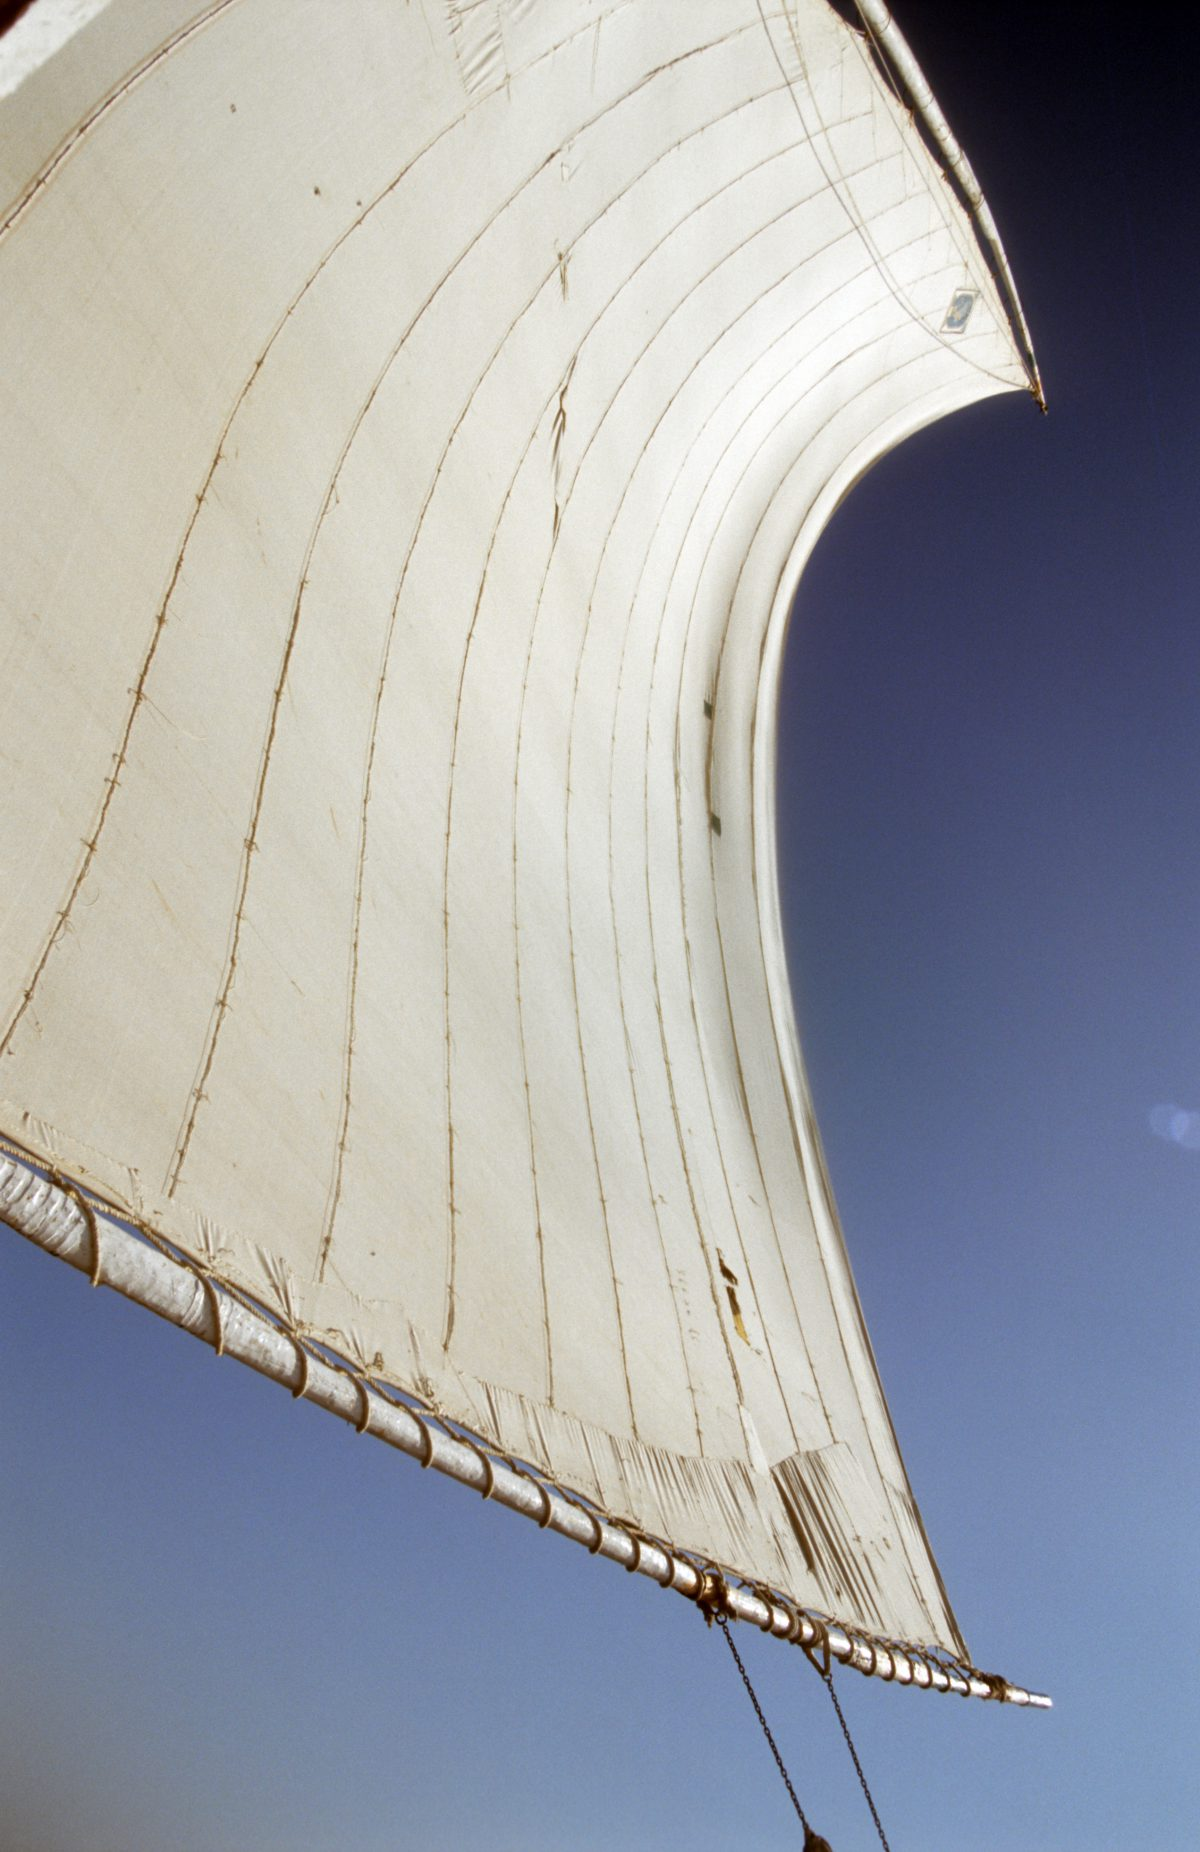 Sail, boat, sky